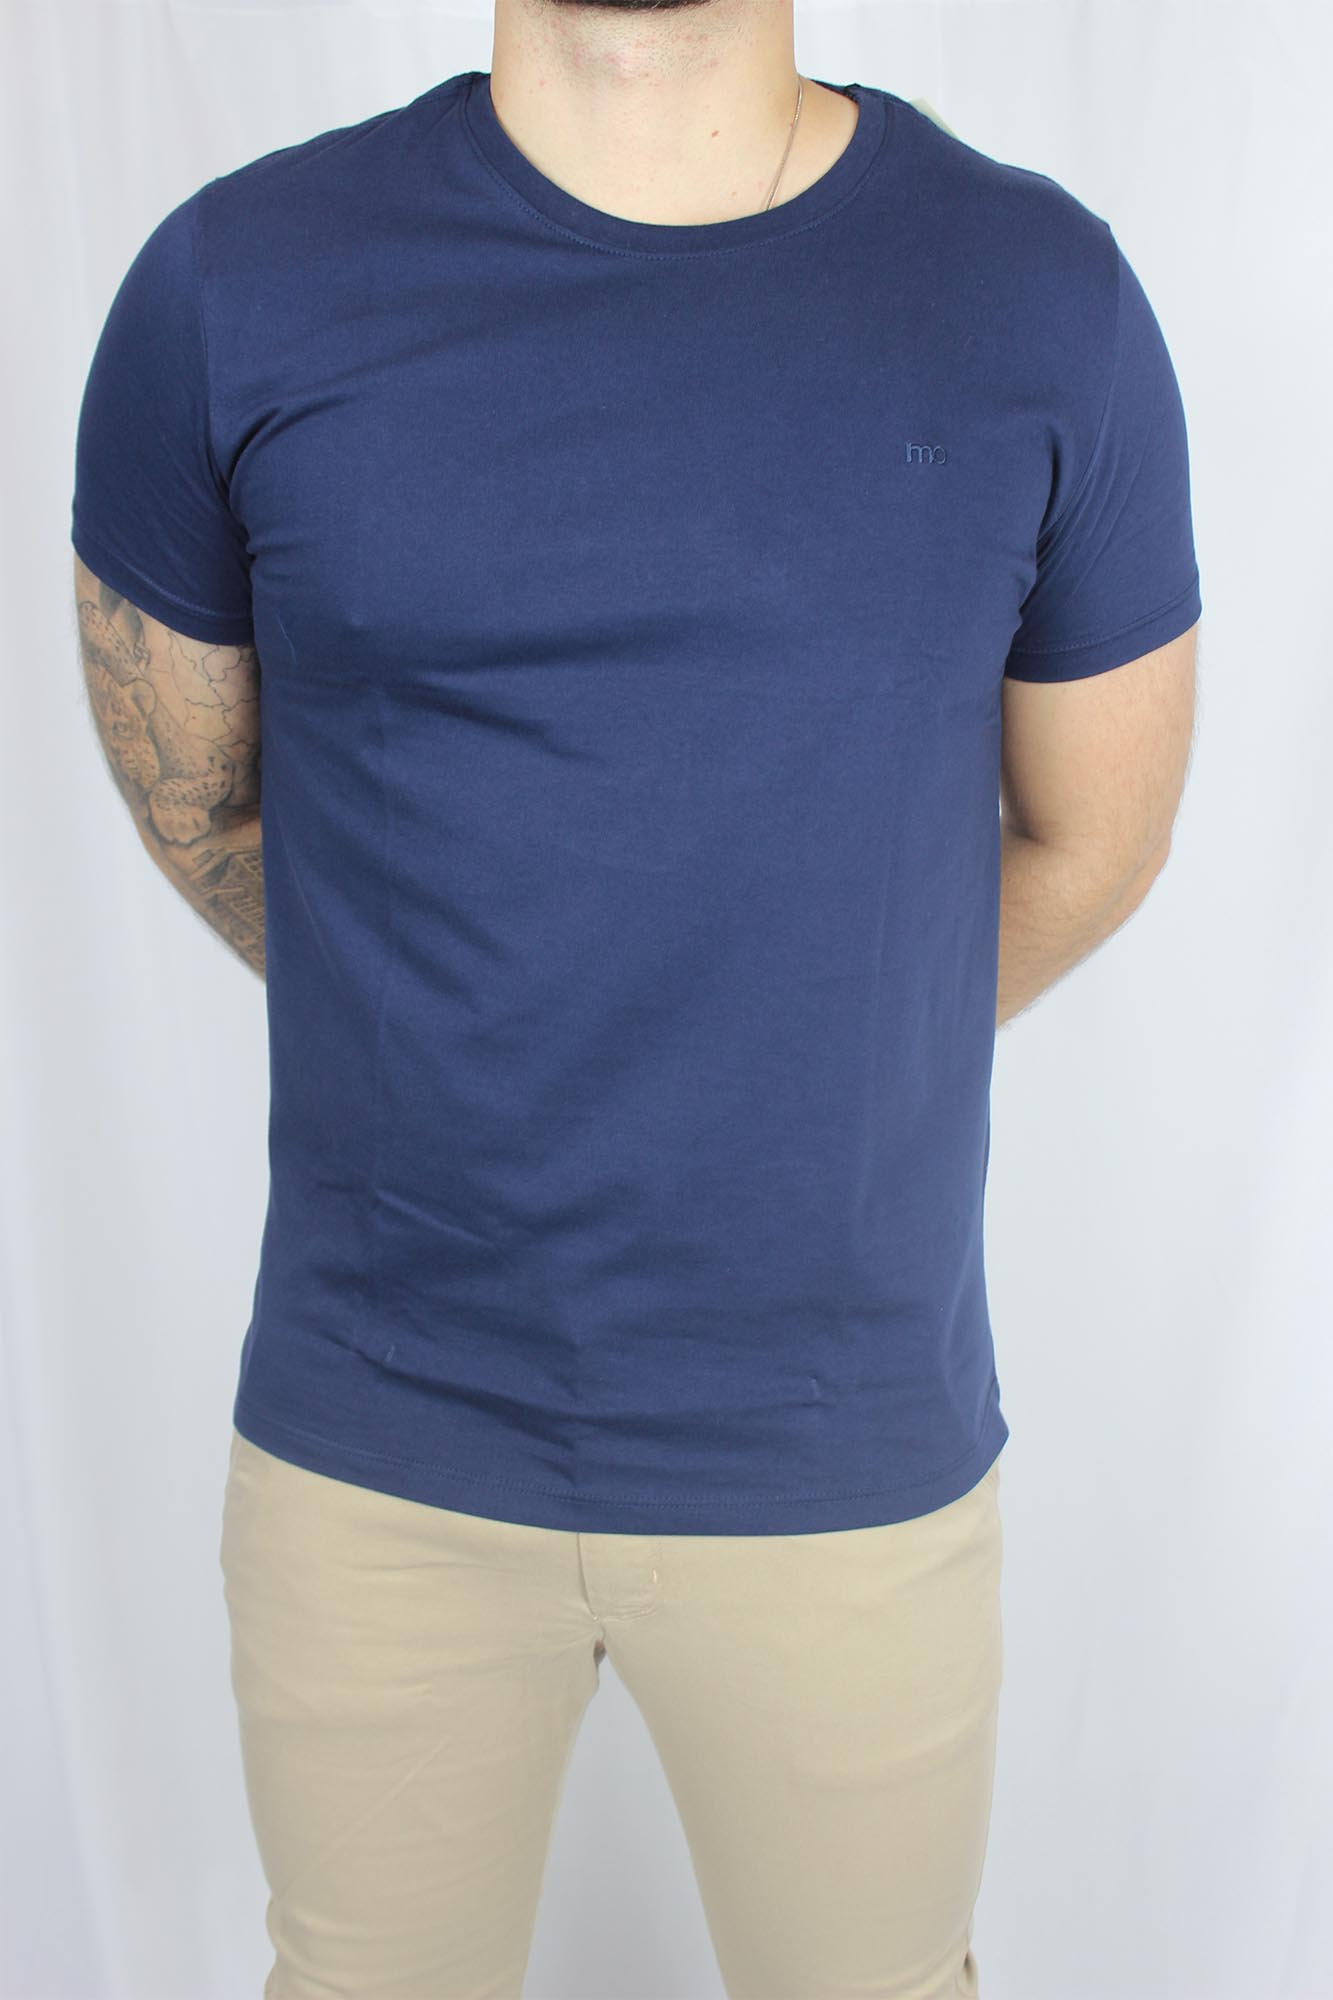 Camiseta Básica Lisa Gola Redonda MO Masculina - Azul Marinha